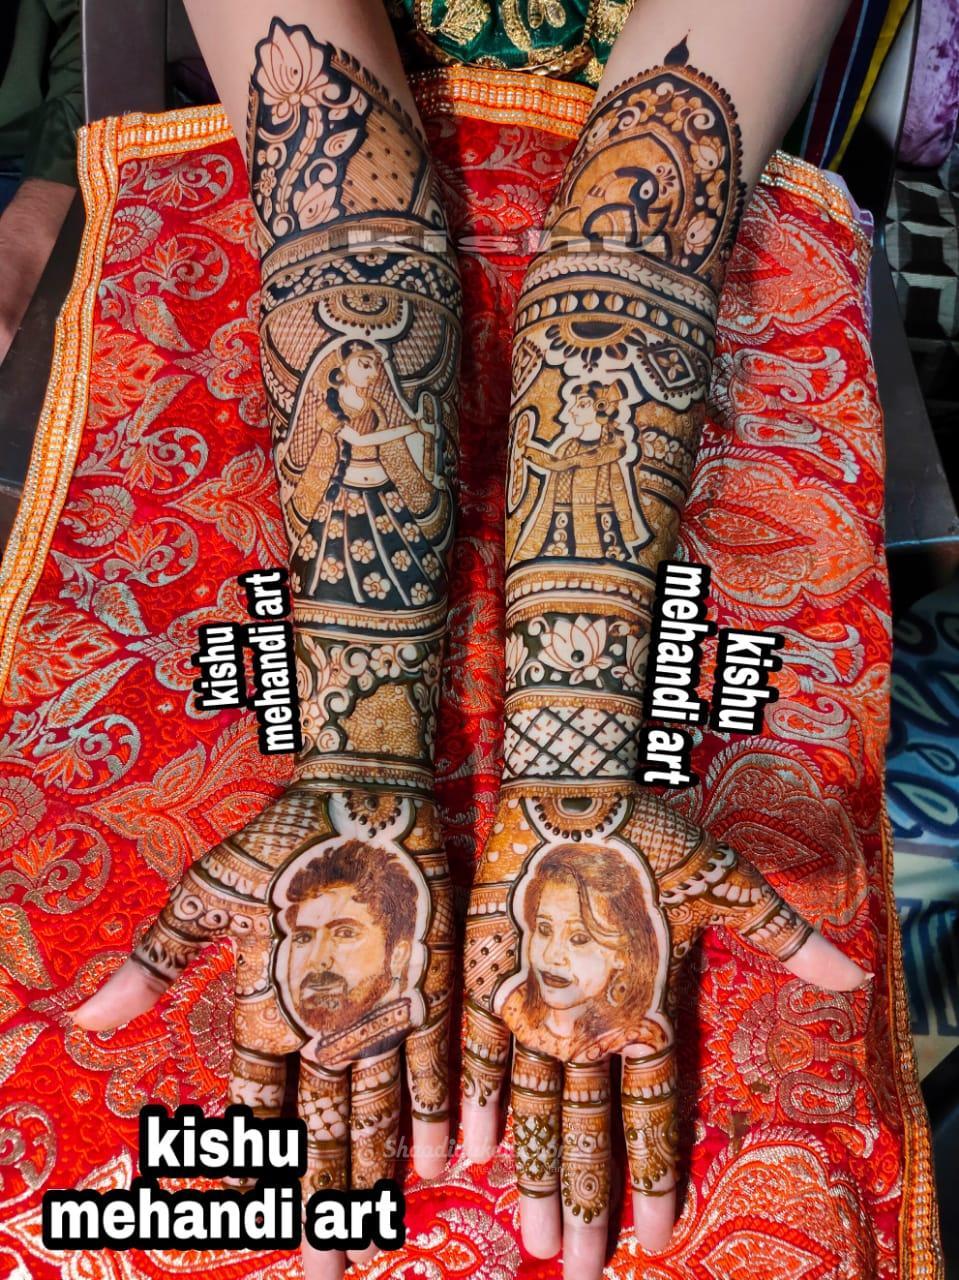 Kishu Mehandi Art